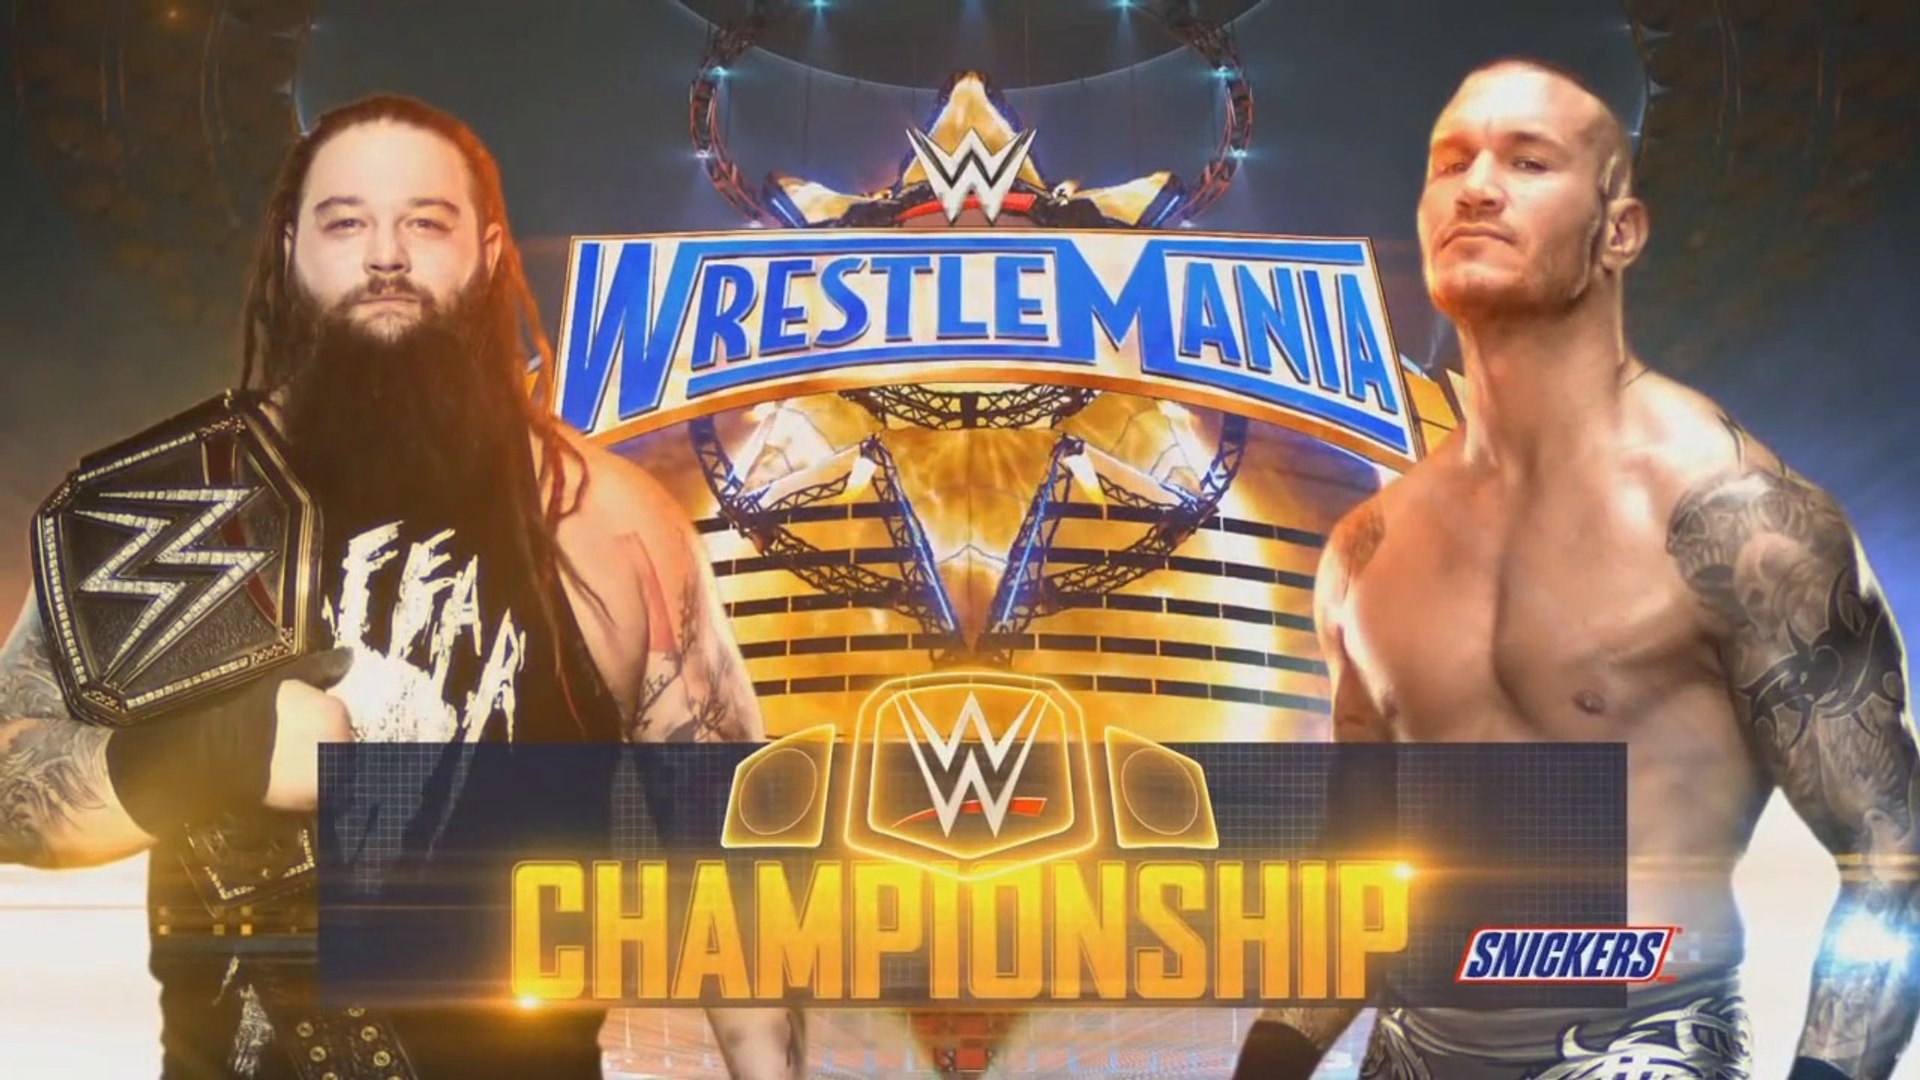 Bray Wyatt vs Randy Orton - WrestleMania 33 - Official Promo - Vídeo  Dailymotion